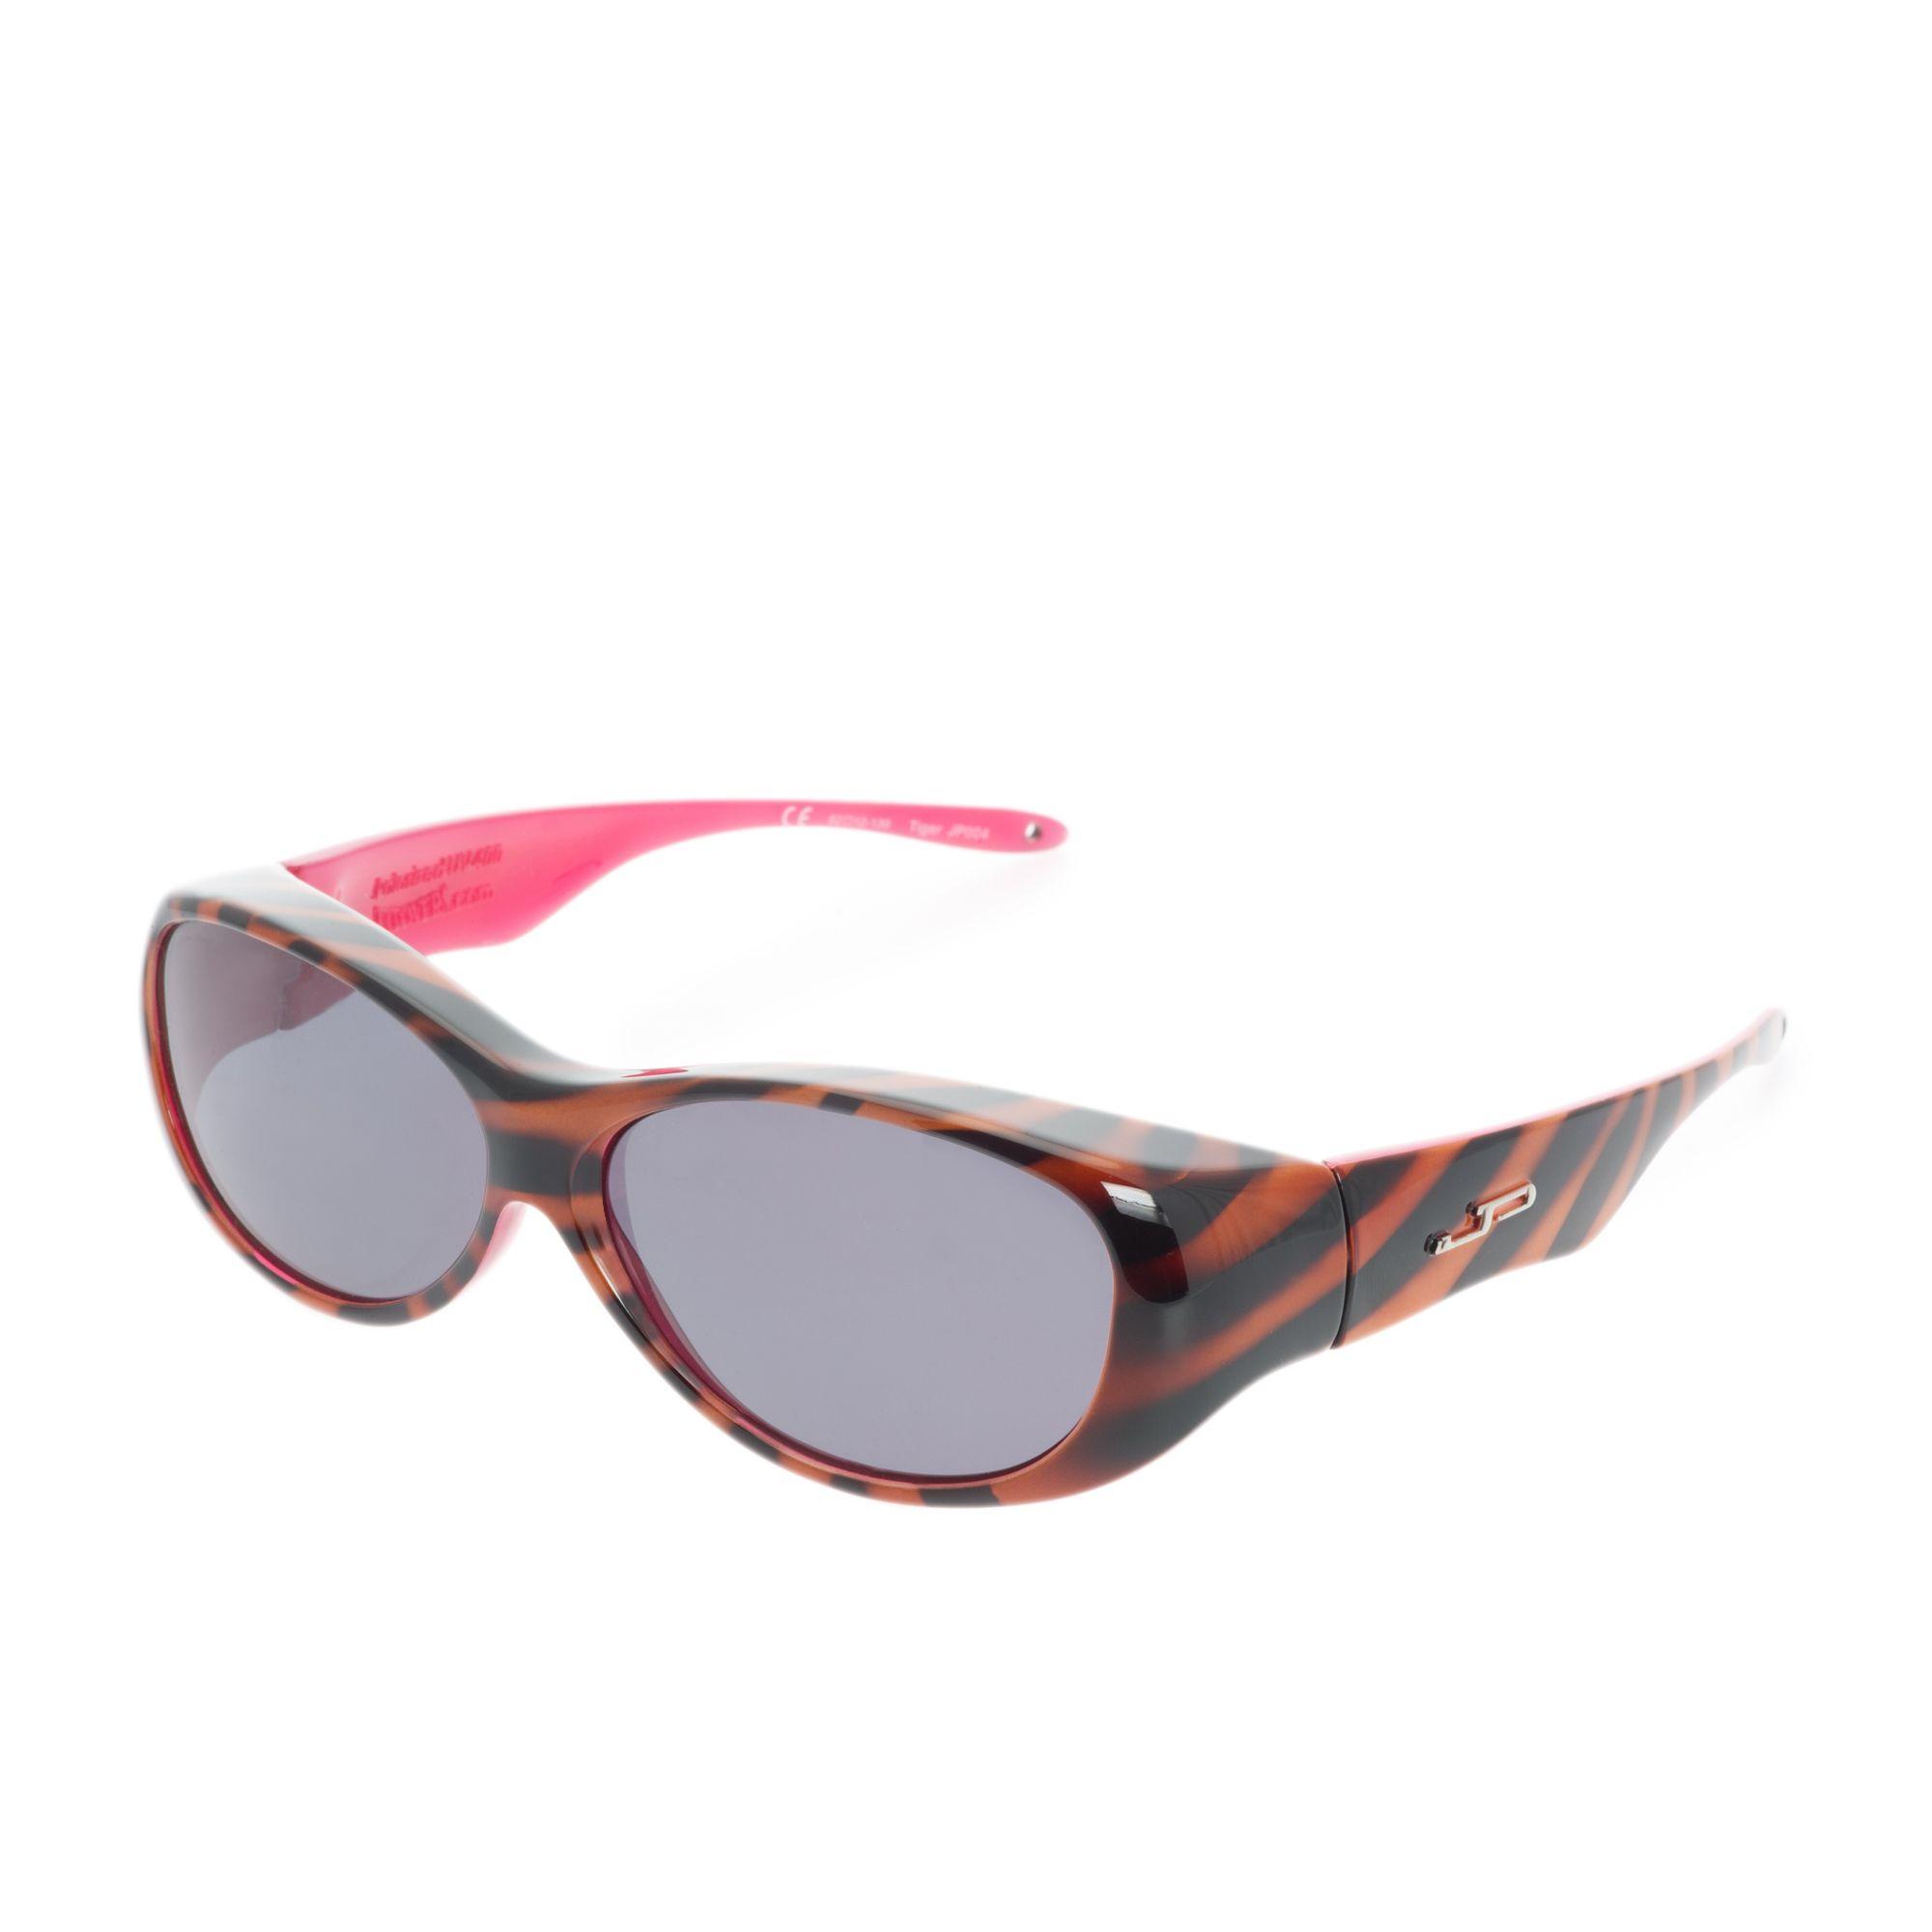 Tiger occhiali da sole indossabili su occhiali da vista for Occhiali da vista da sole